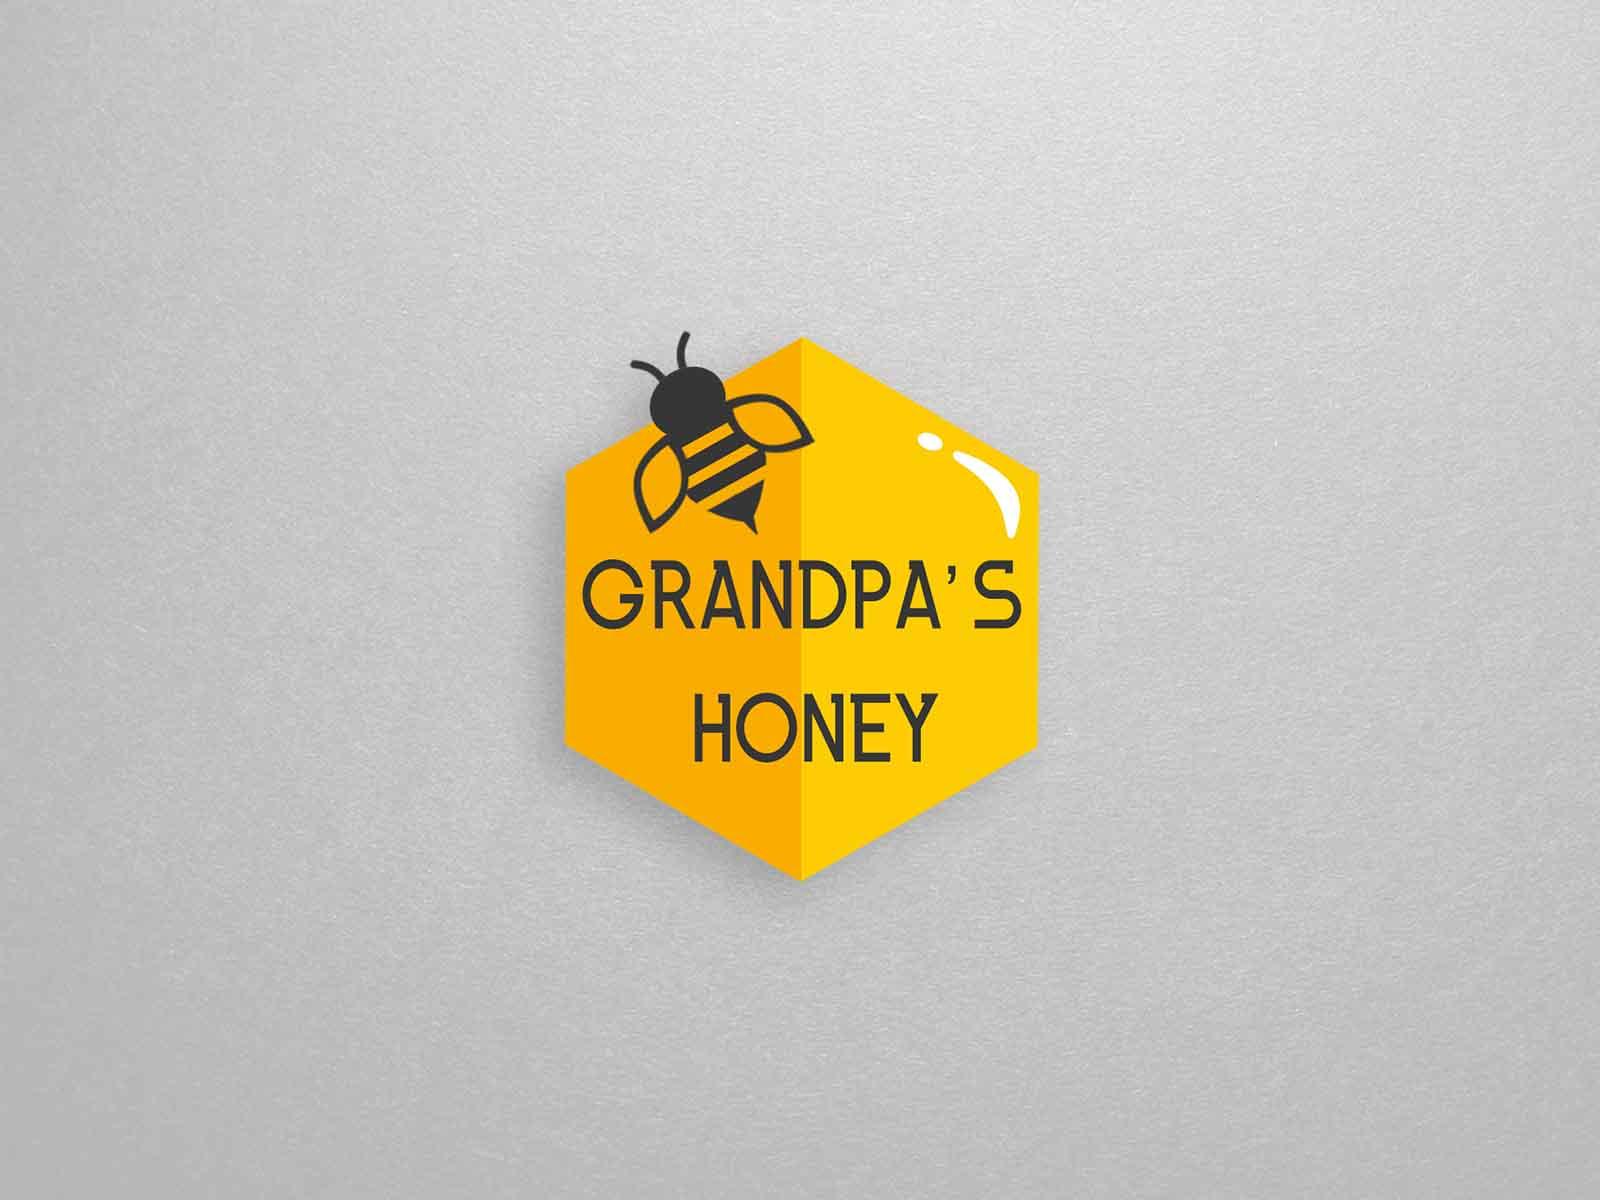 grandpa's-honey-logo